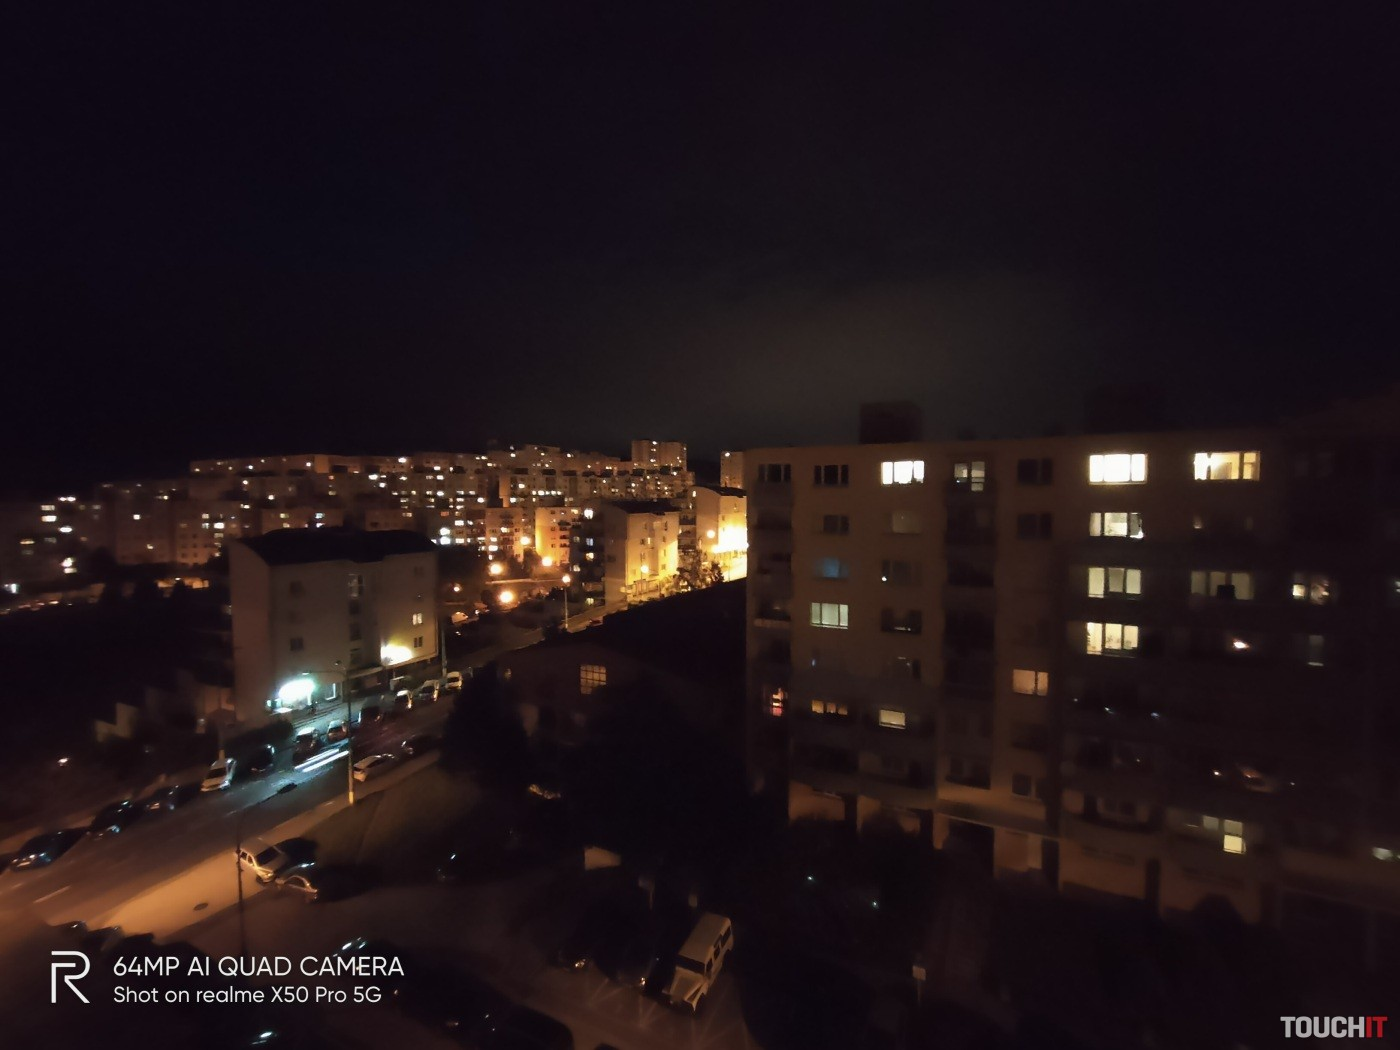 Fotené Realme X50 Pro 5G